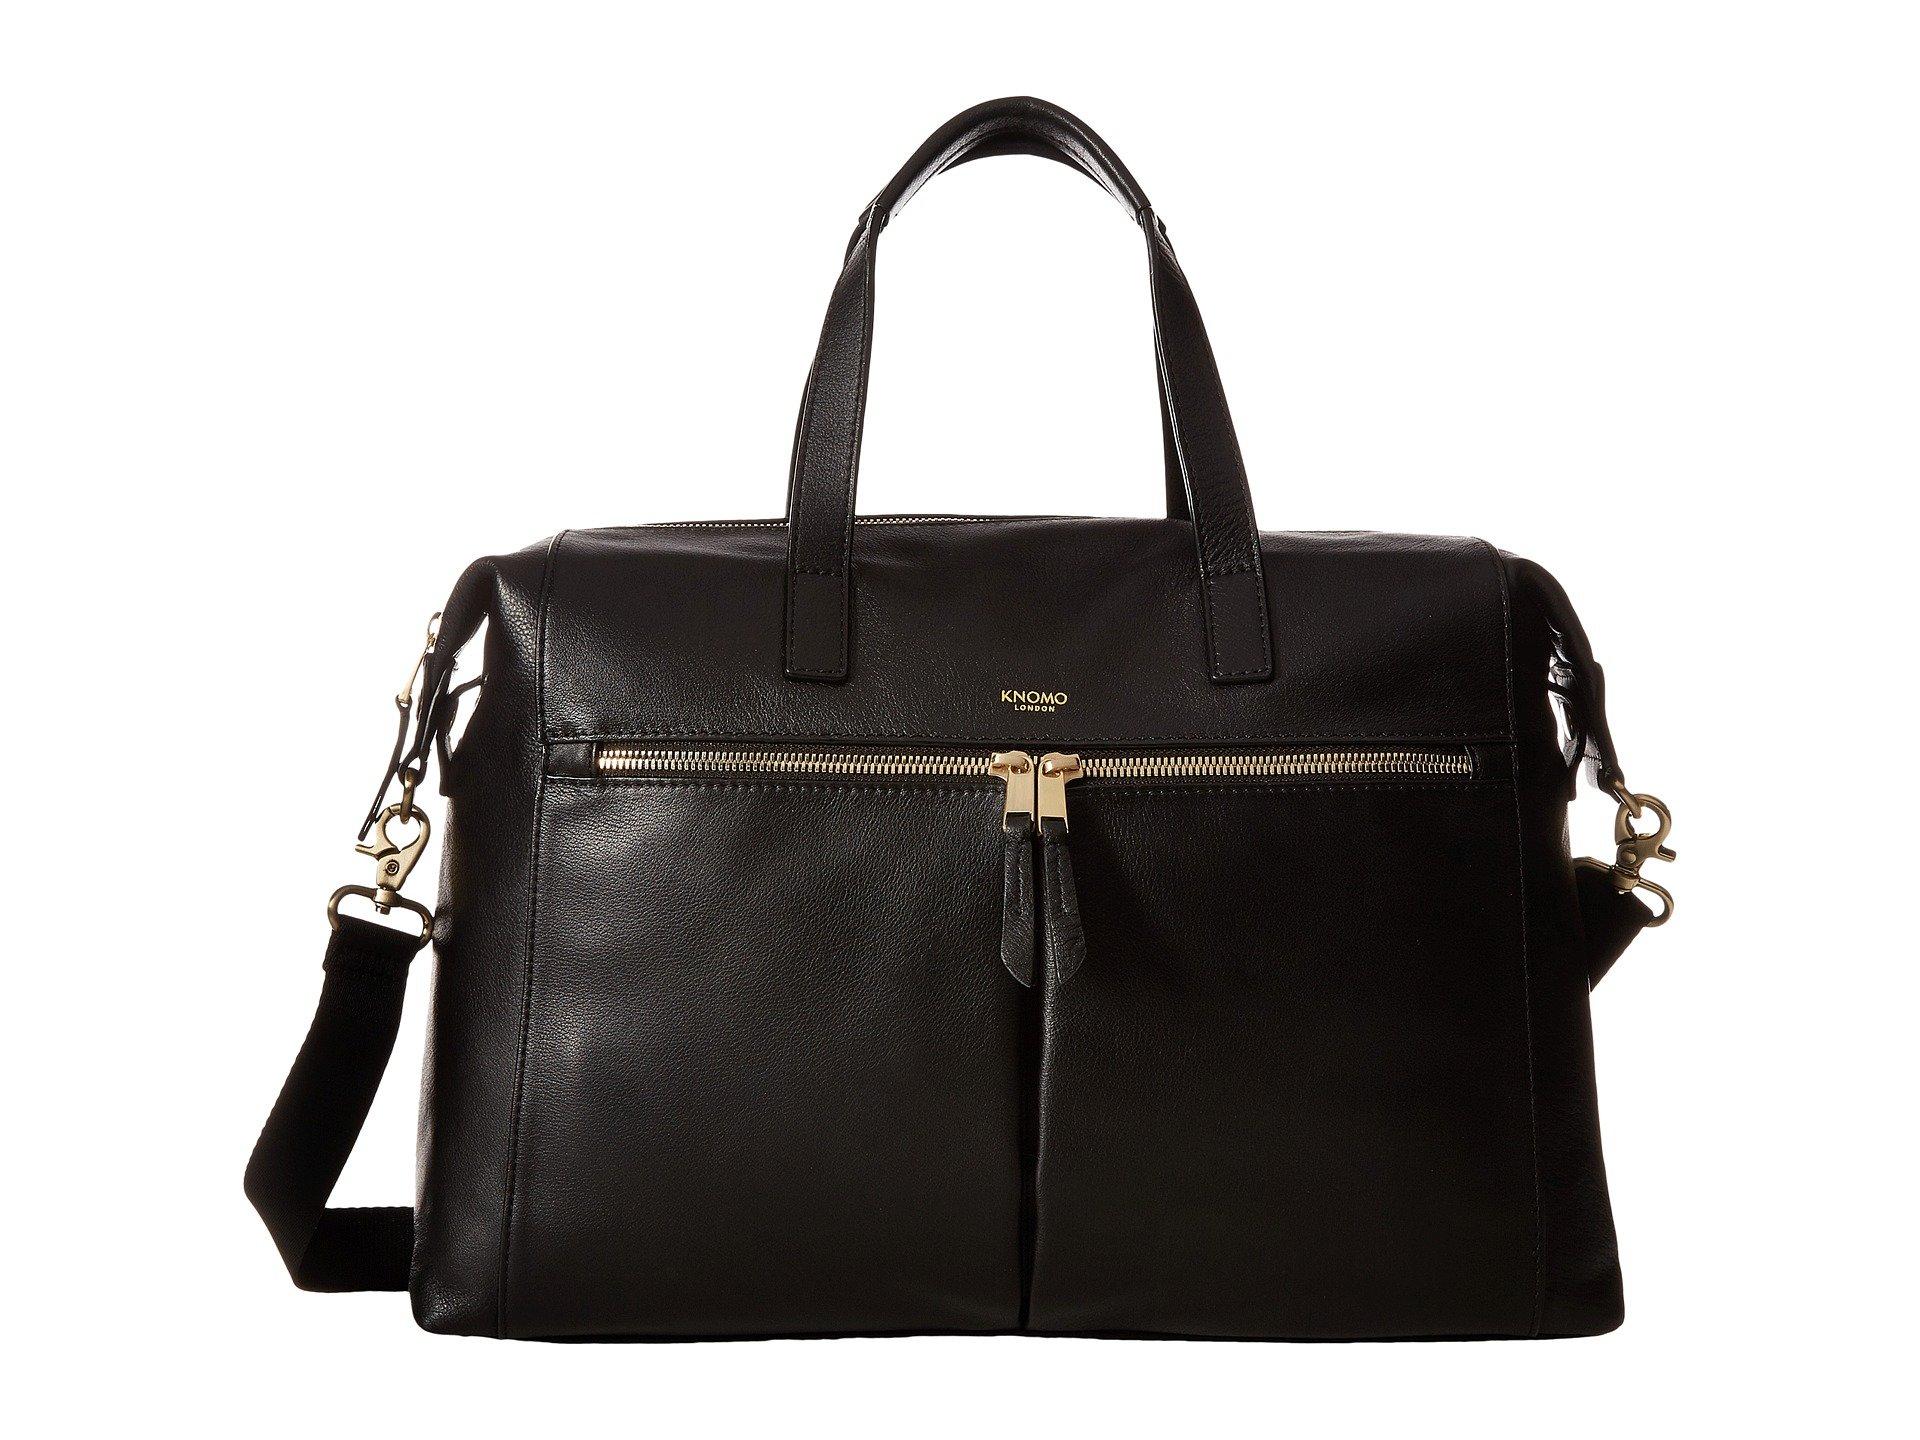 Knomo Audley Black London Slim Luxe Mayfair Brief Tote 7tt0rq6w